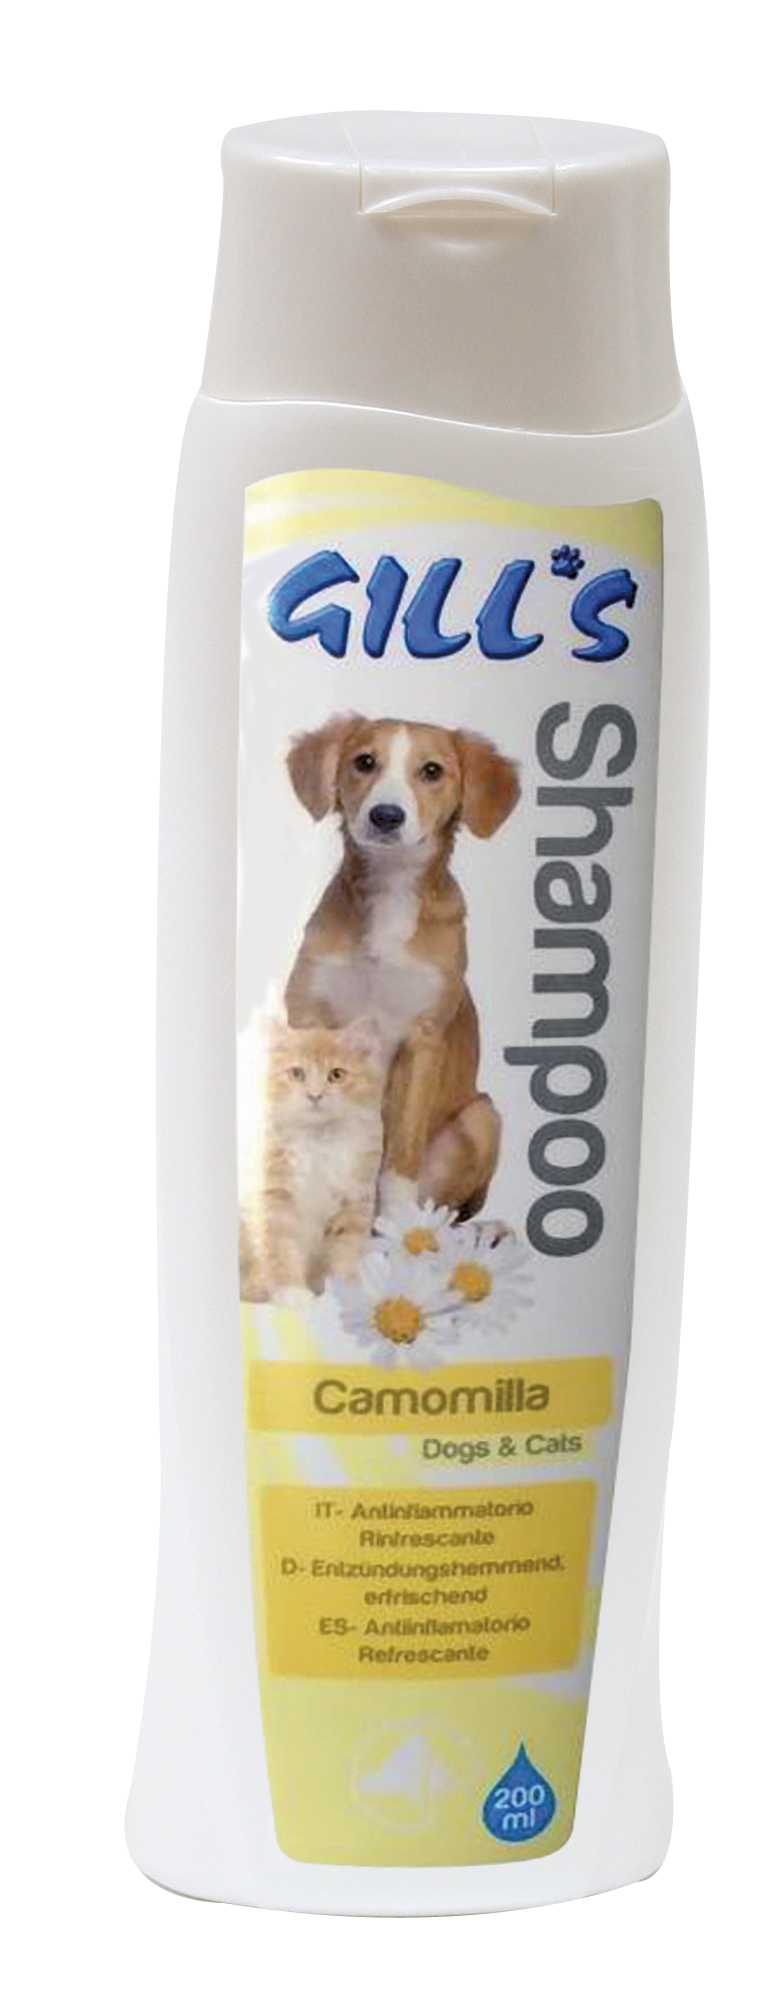 Image of Gill's Shampoo Camomilla 200 ml 9018428